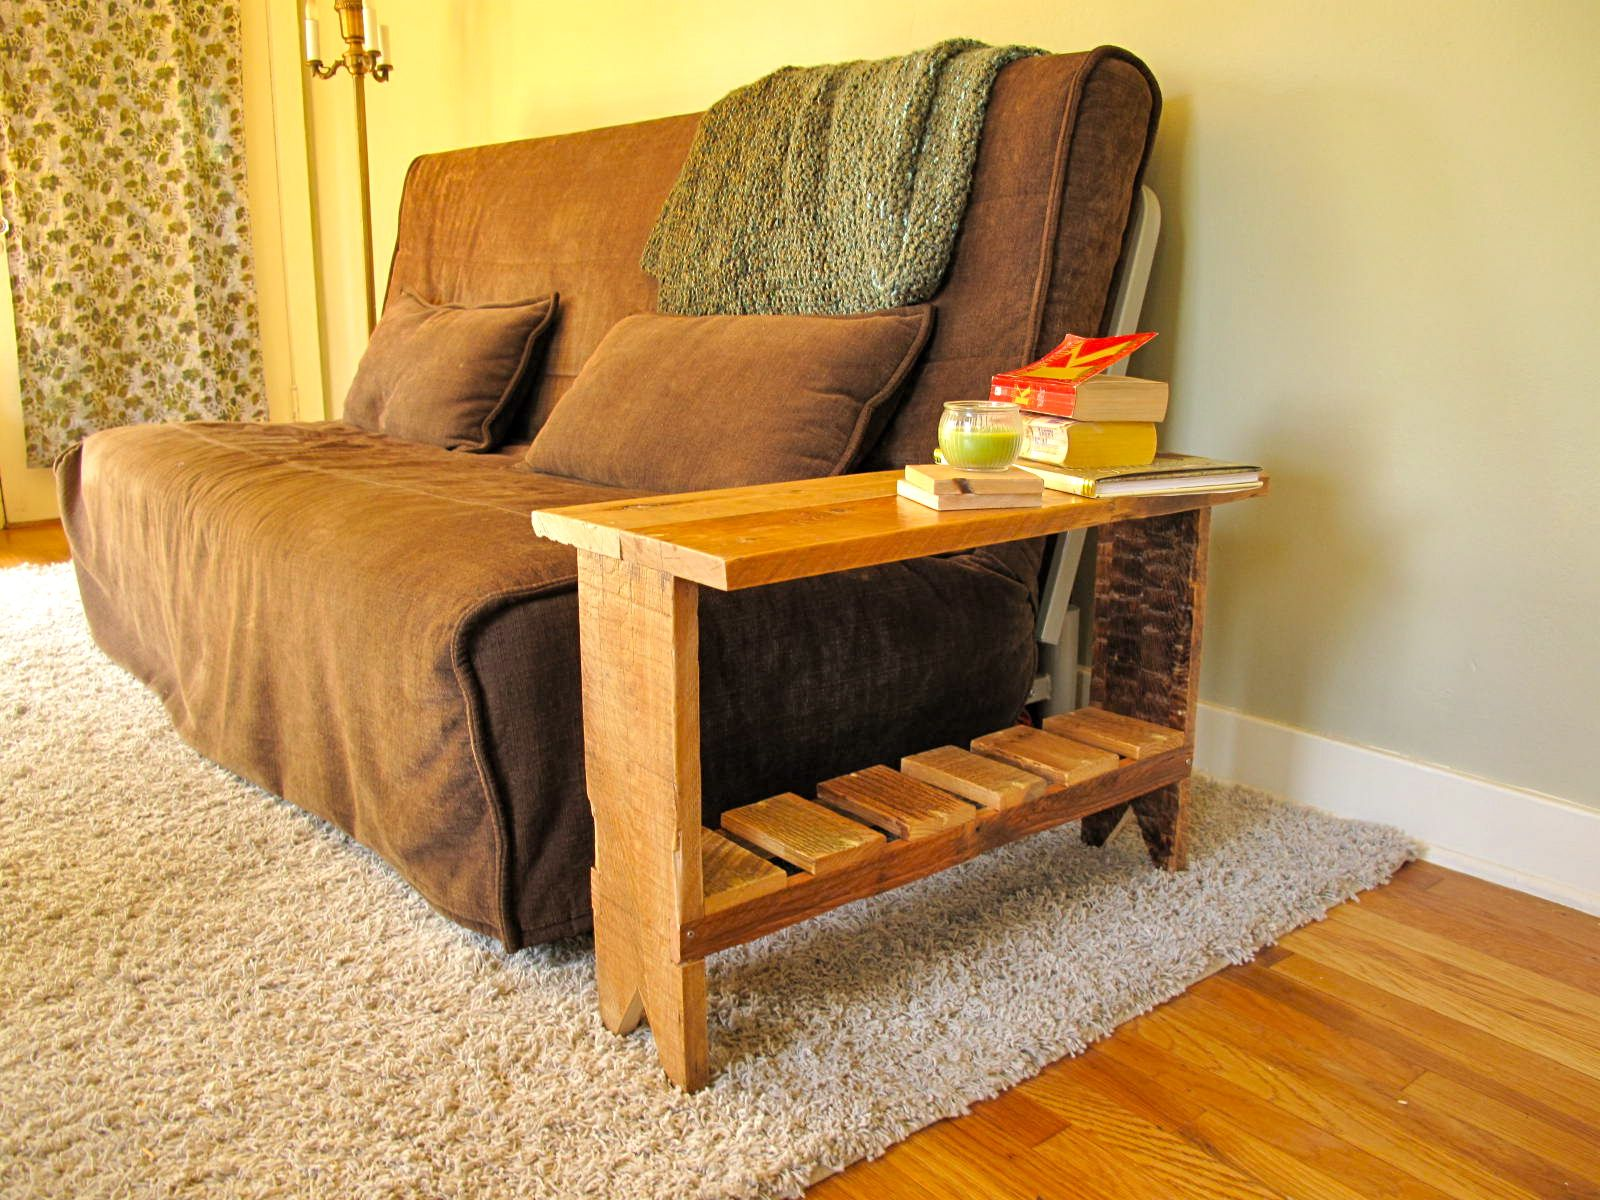 Mesa elaborada con estiba reciclada   DIY - HUM   Pinterest ...